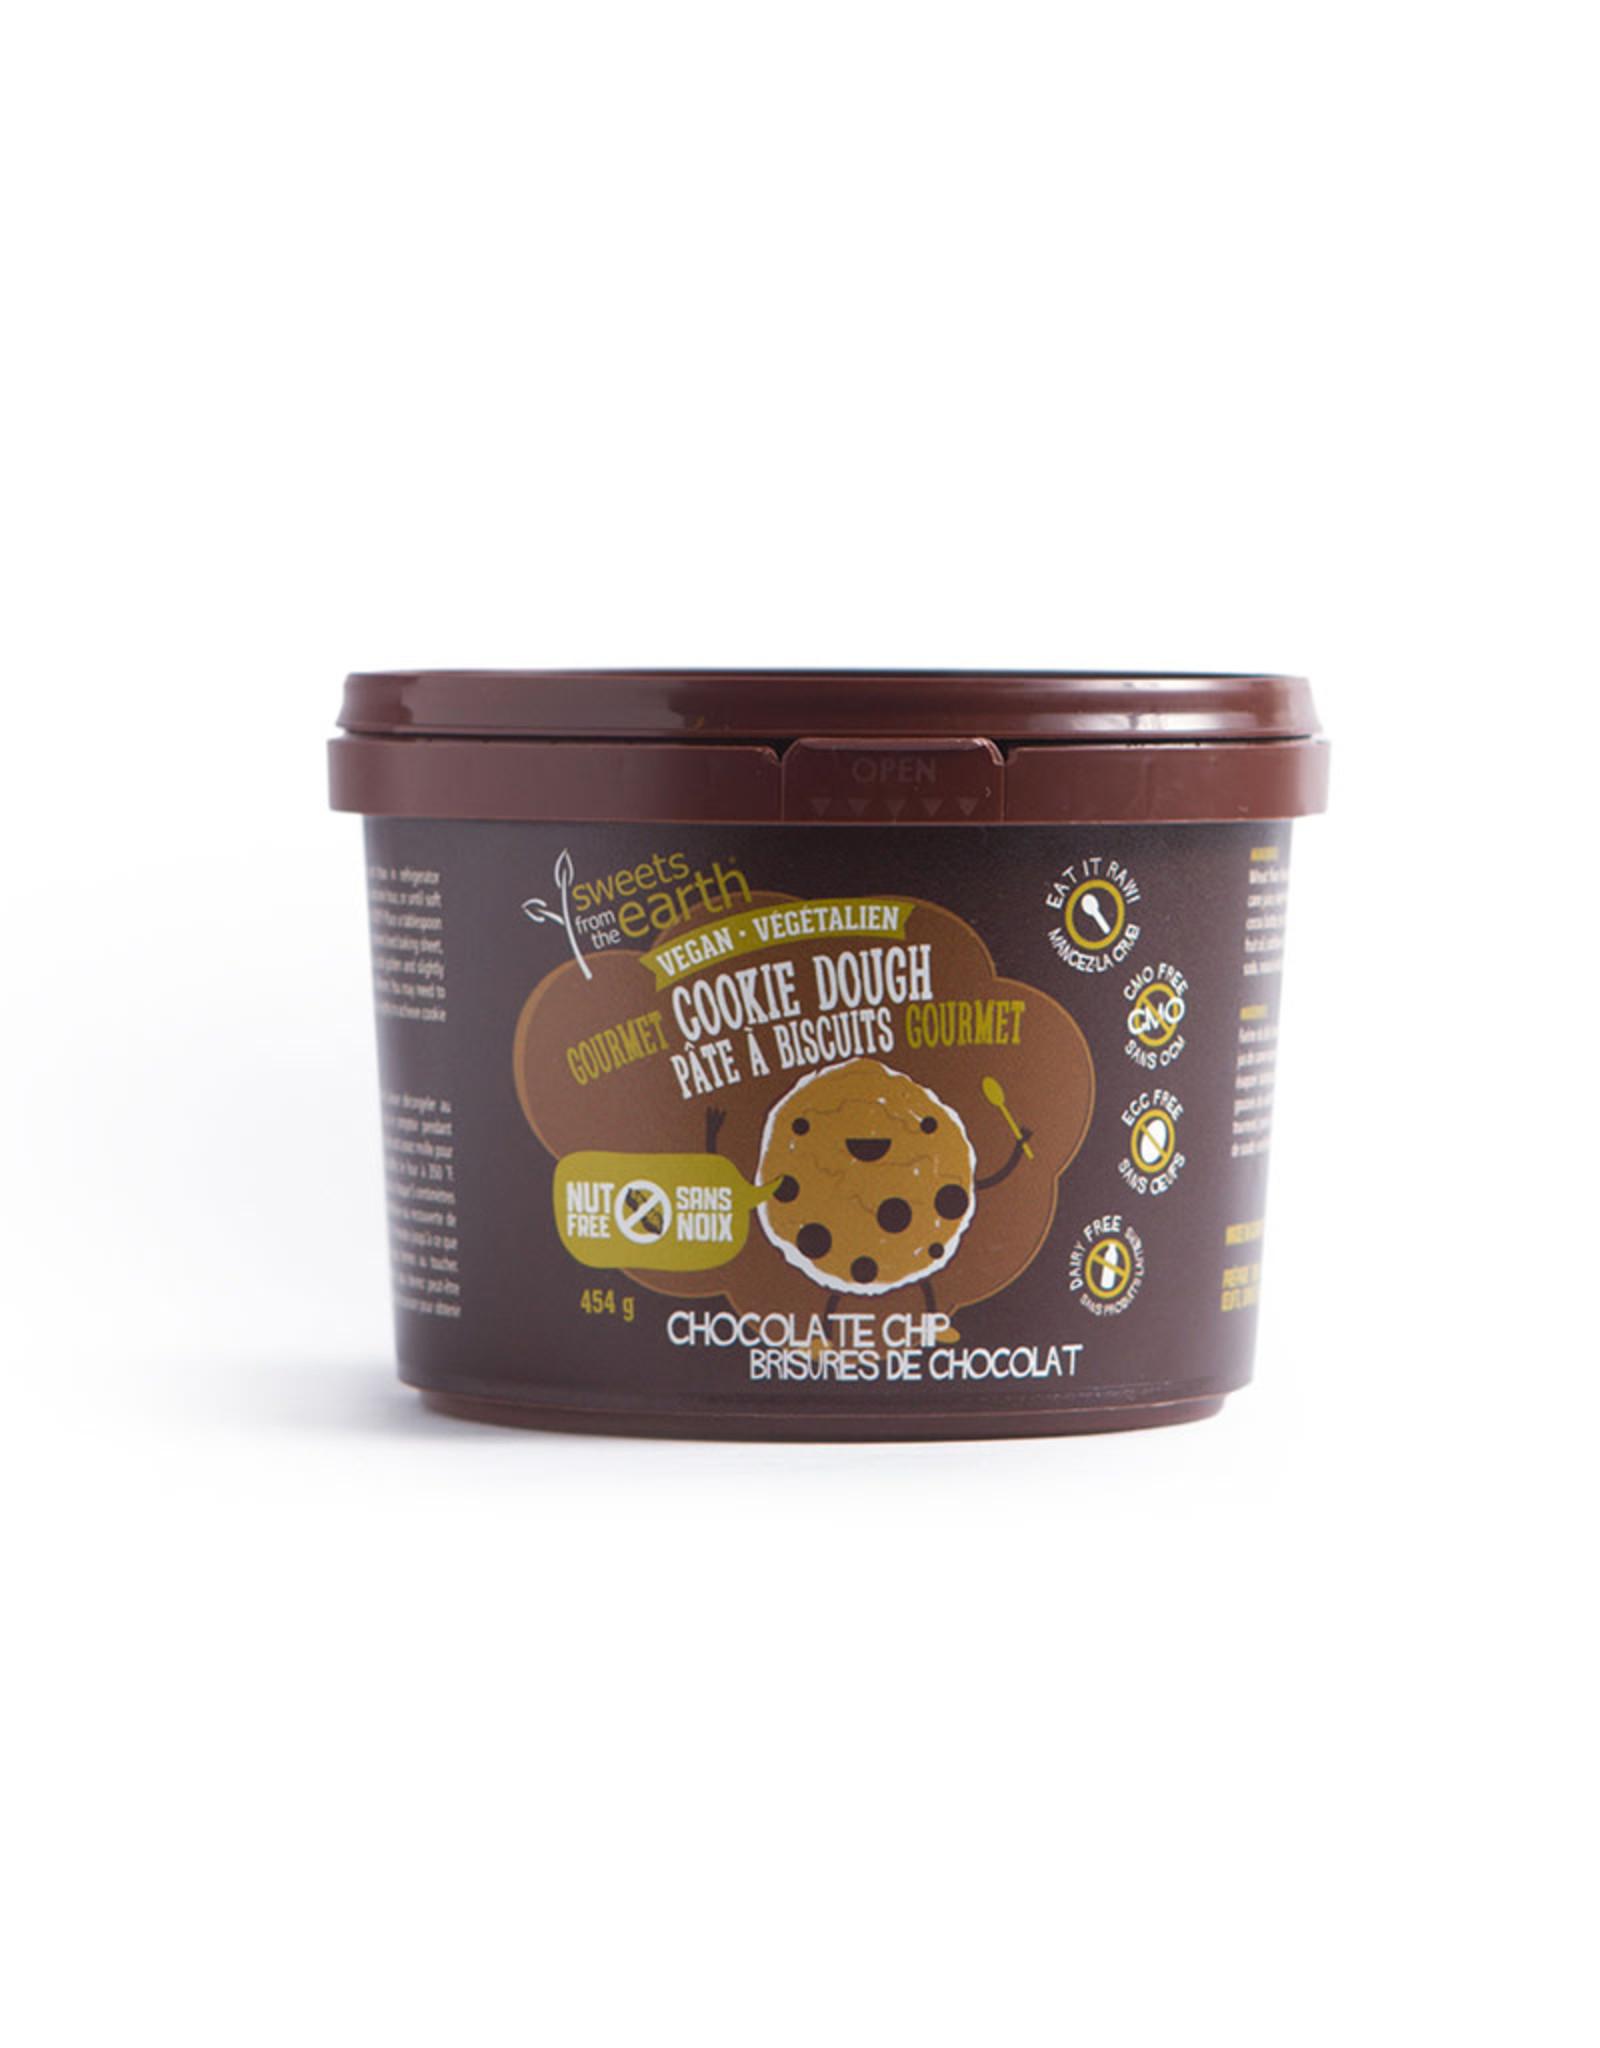 Sweets From The Earth Sweets From The Earth - Chocolate Chip Cookie Dough